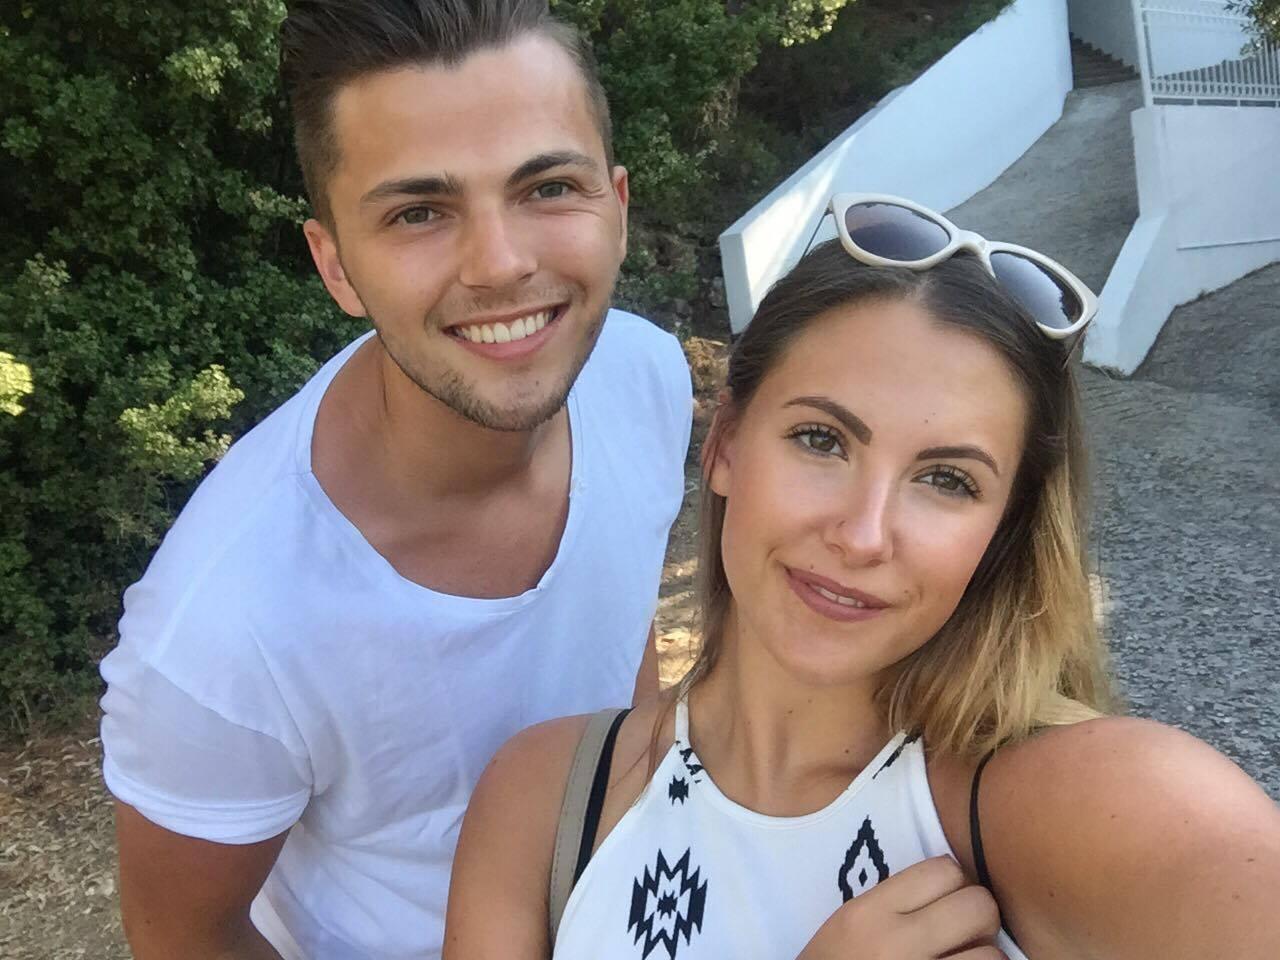 Leon-heidrich-couple-love-fashionforffranzy-blogger